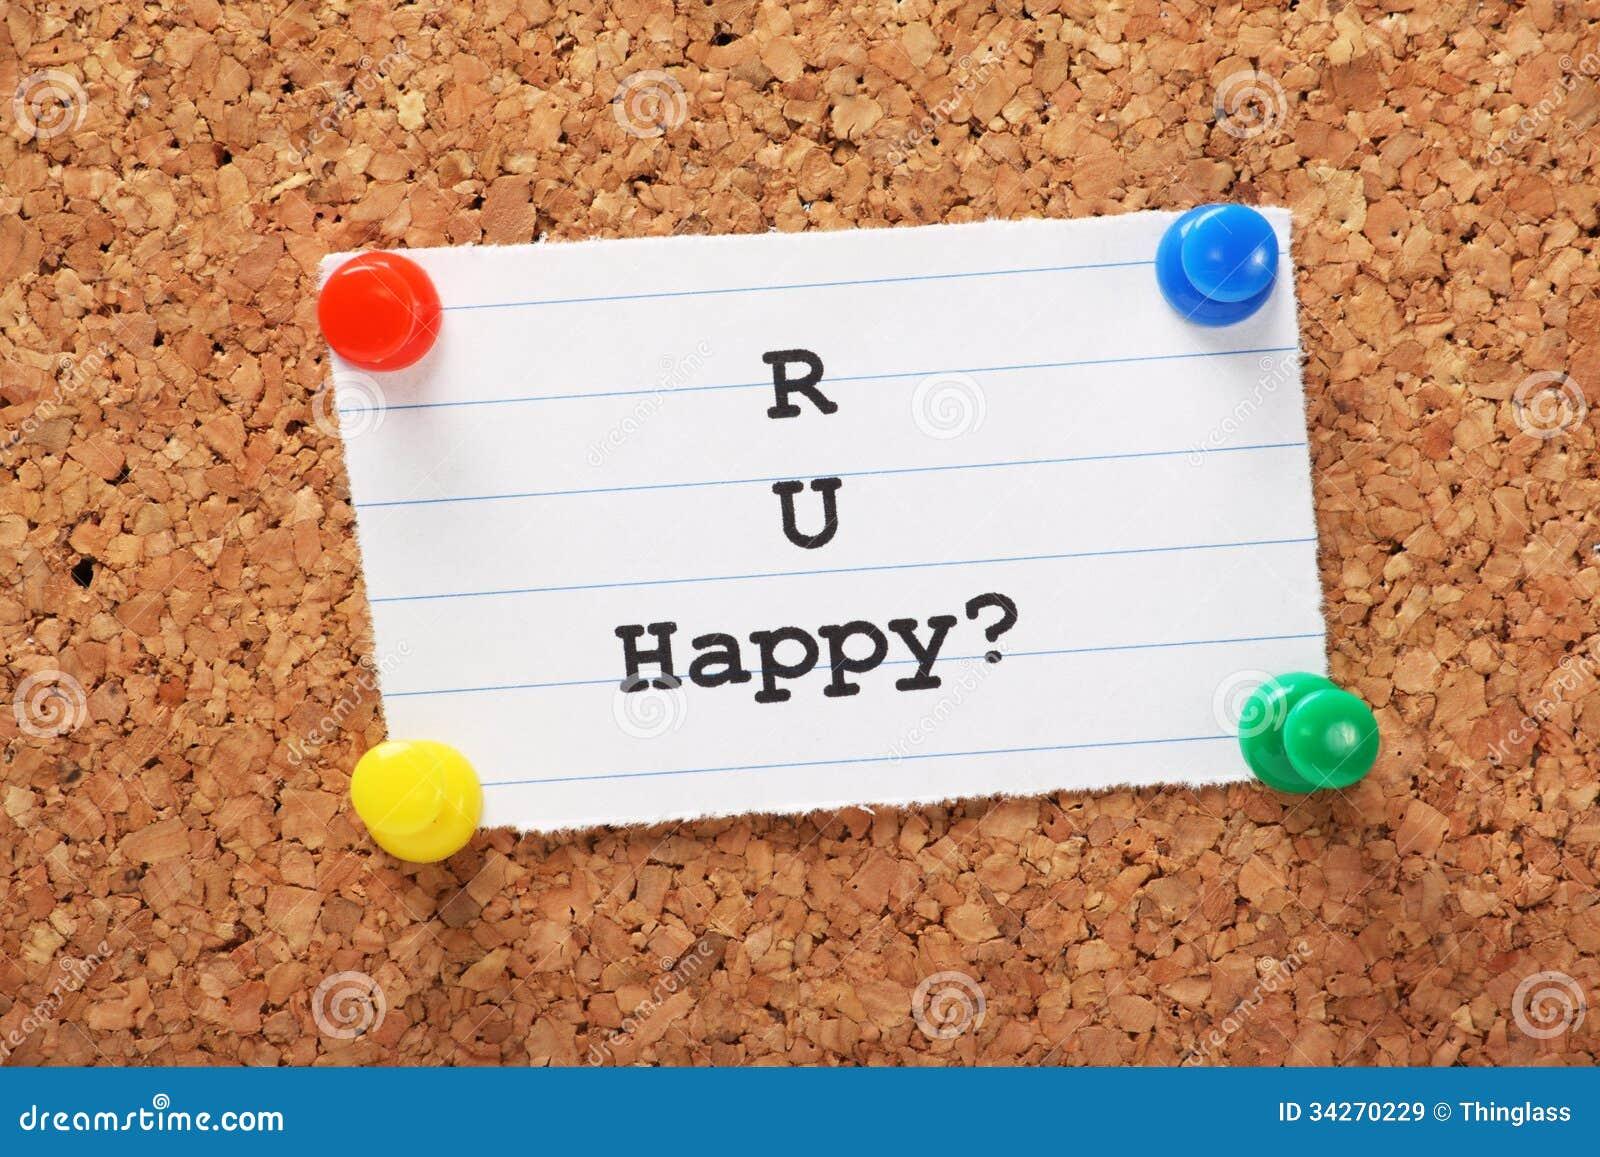 Lyckligt R U?